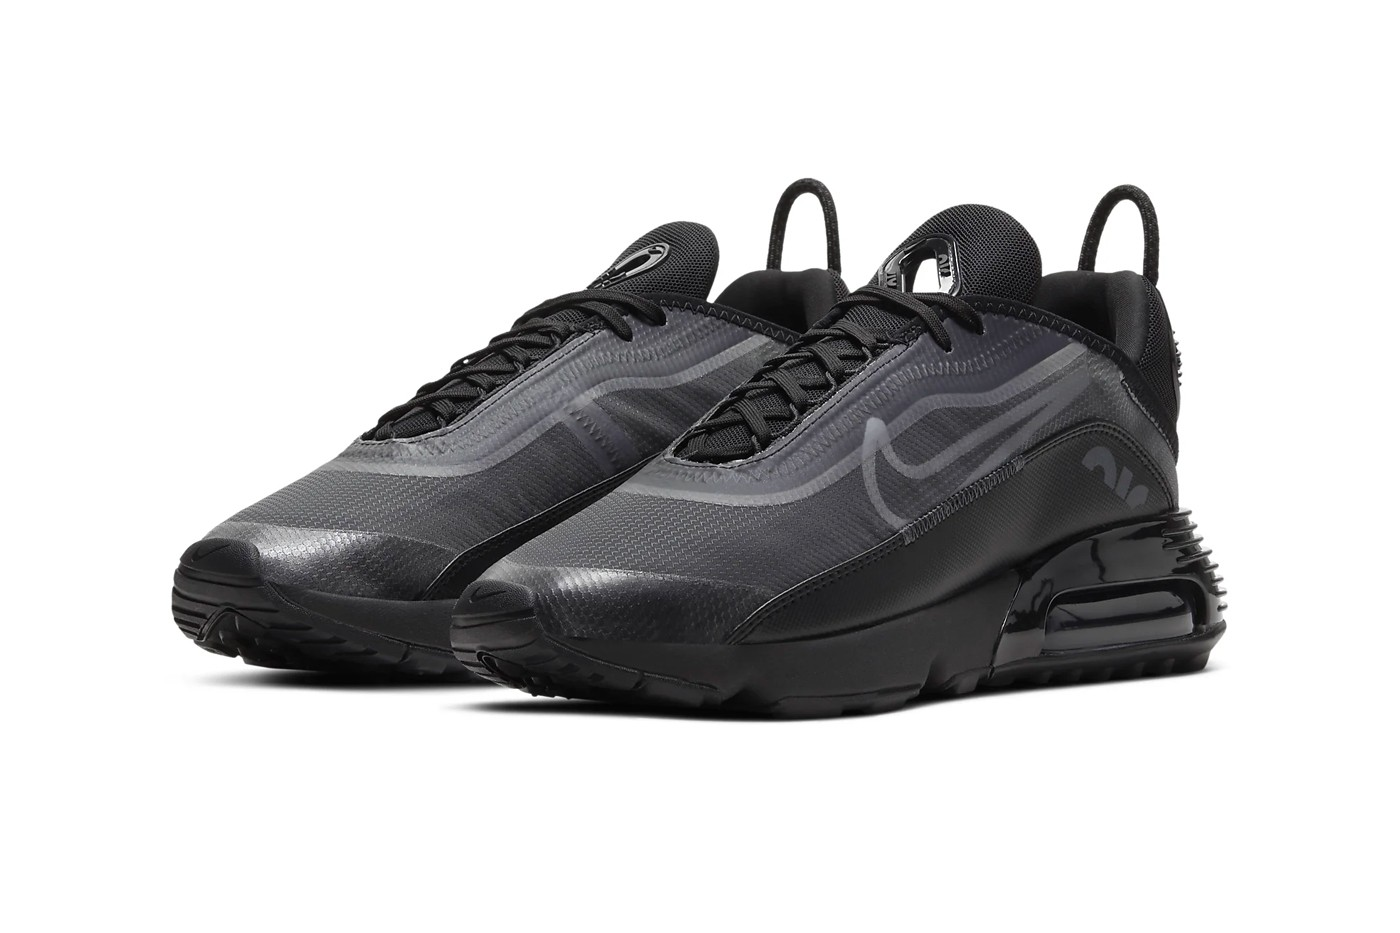 Nike Air Max 2090 Appears in \